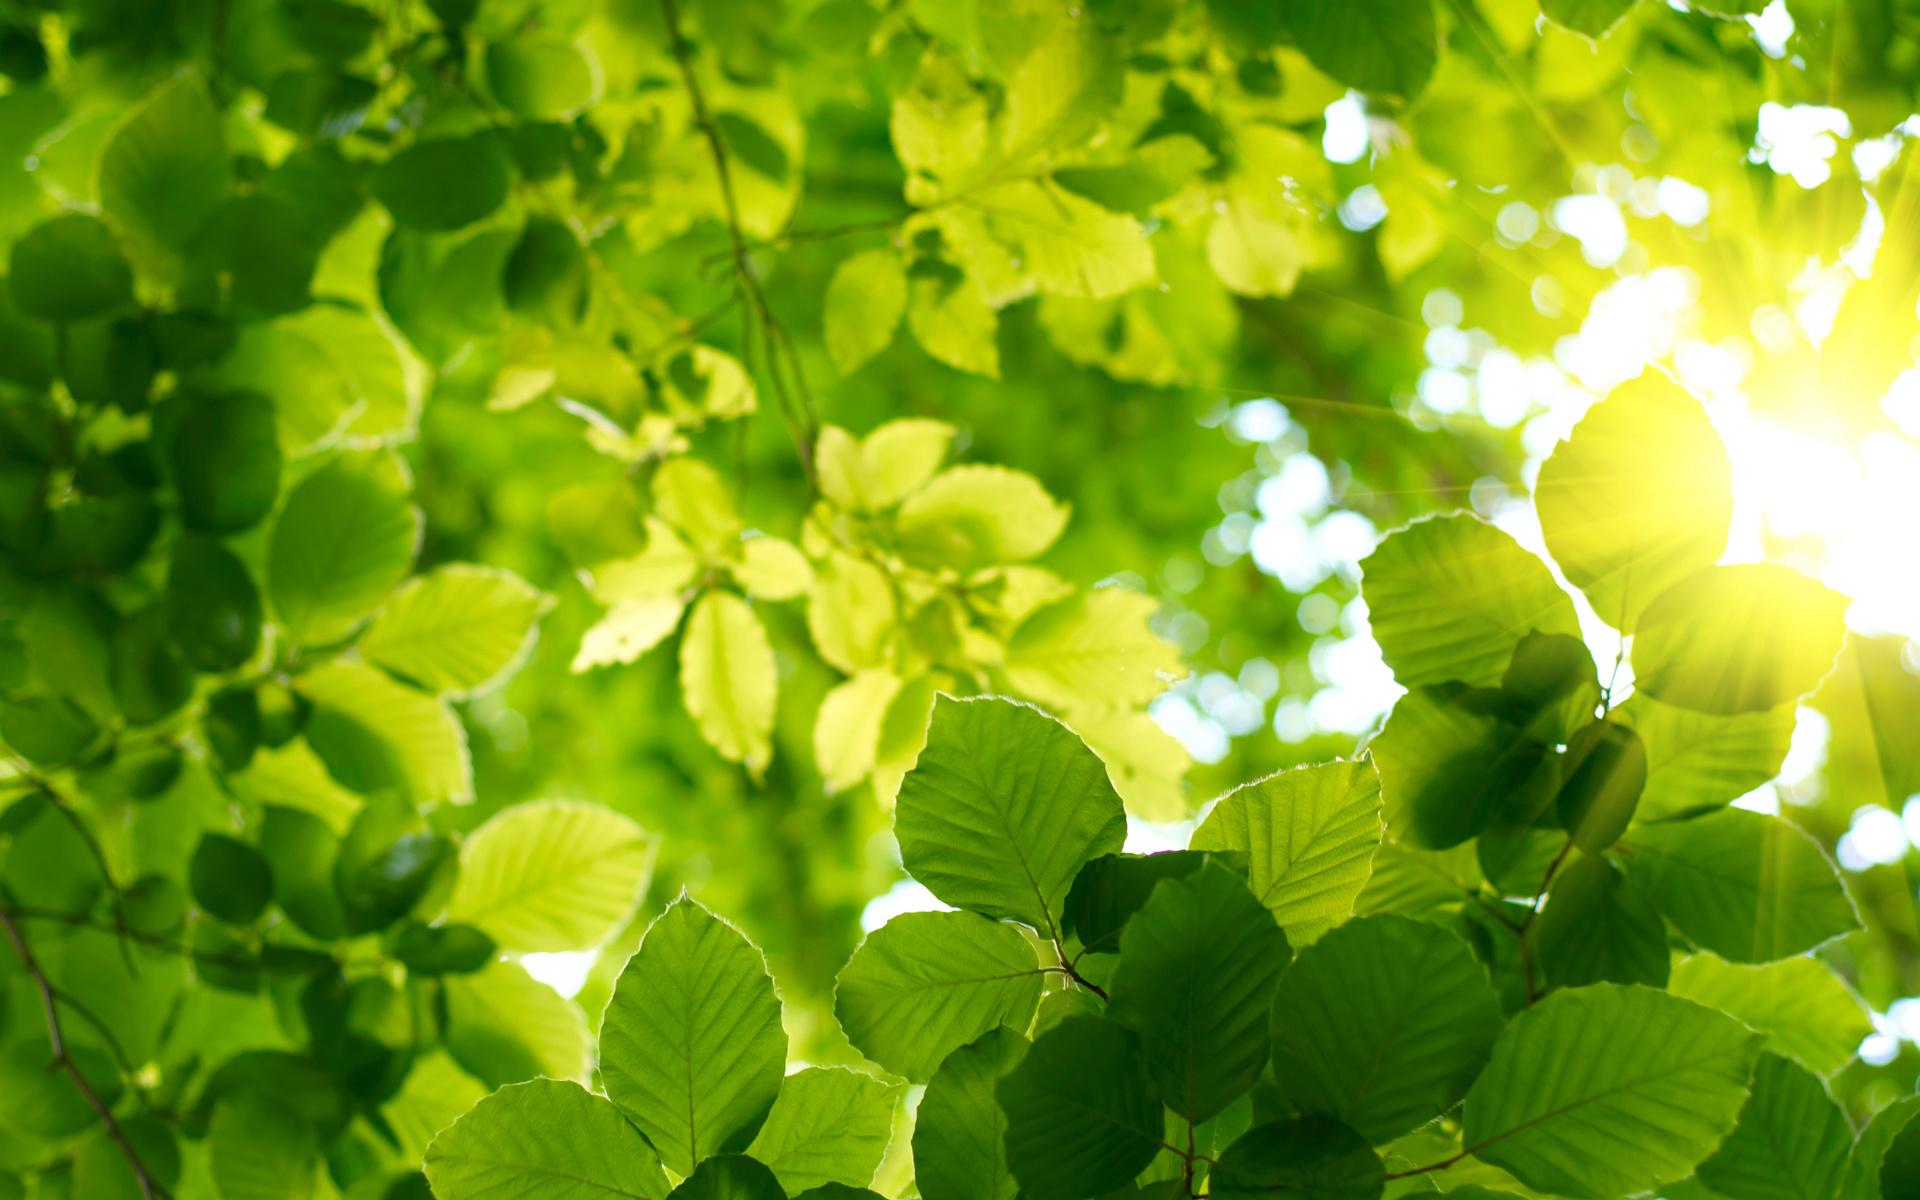 весна, солнце, Лес, листья, лето, зелень, небо